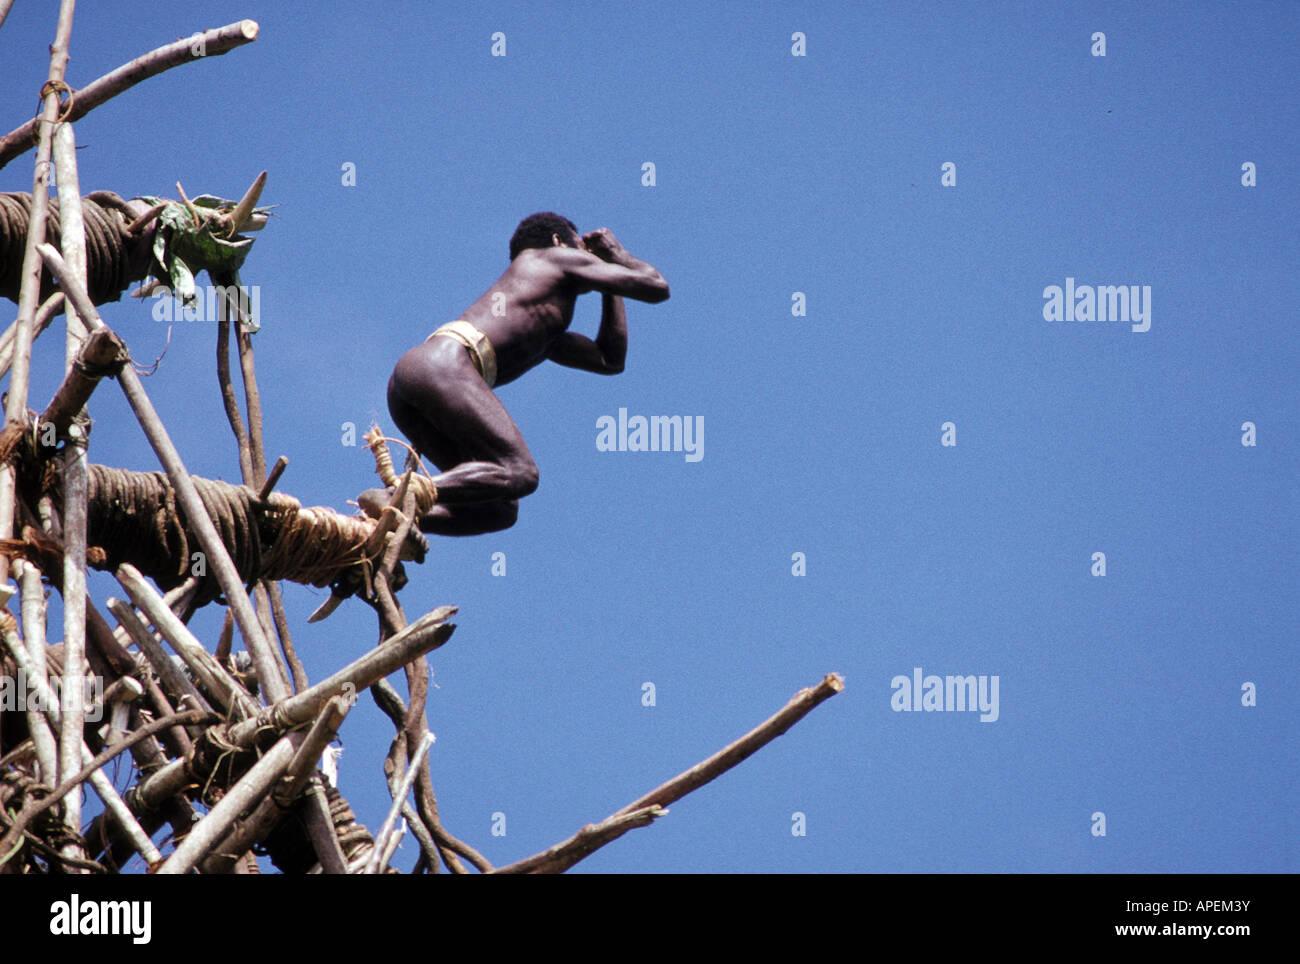 Pacific Ocean, Vanuatu, Pentecost Island, Native Islander jumping off platform - Stock Image